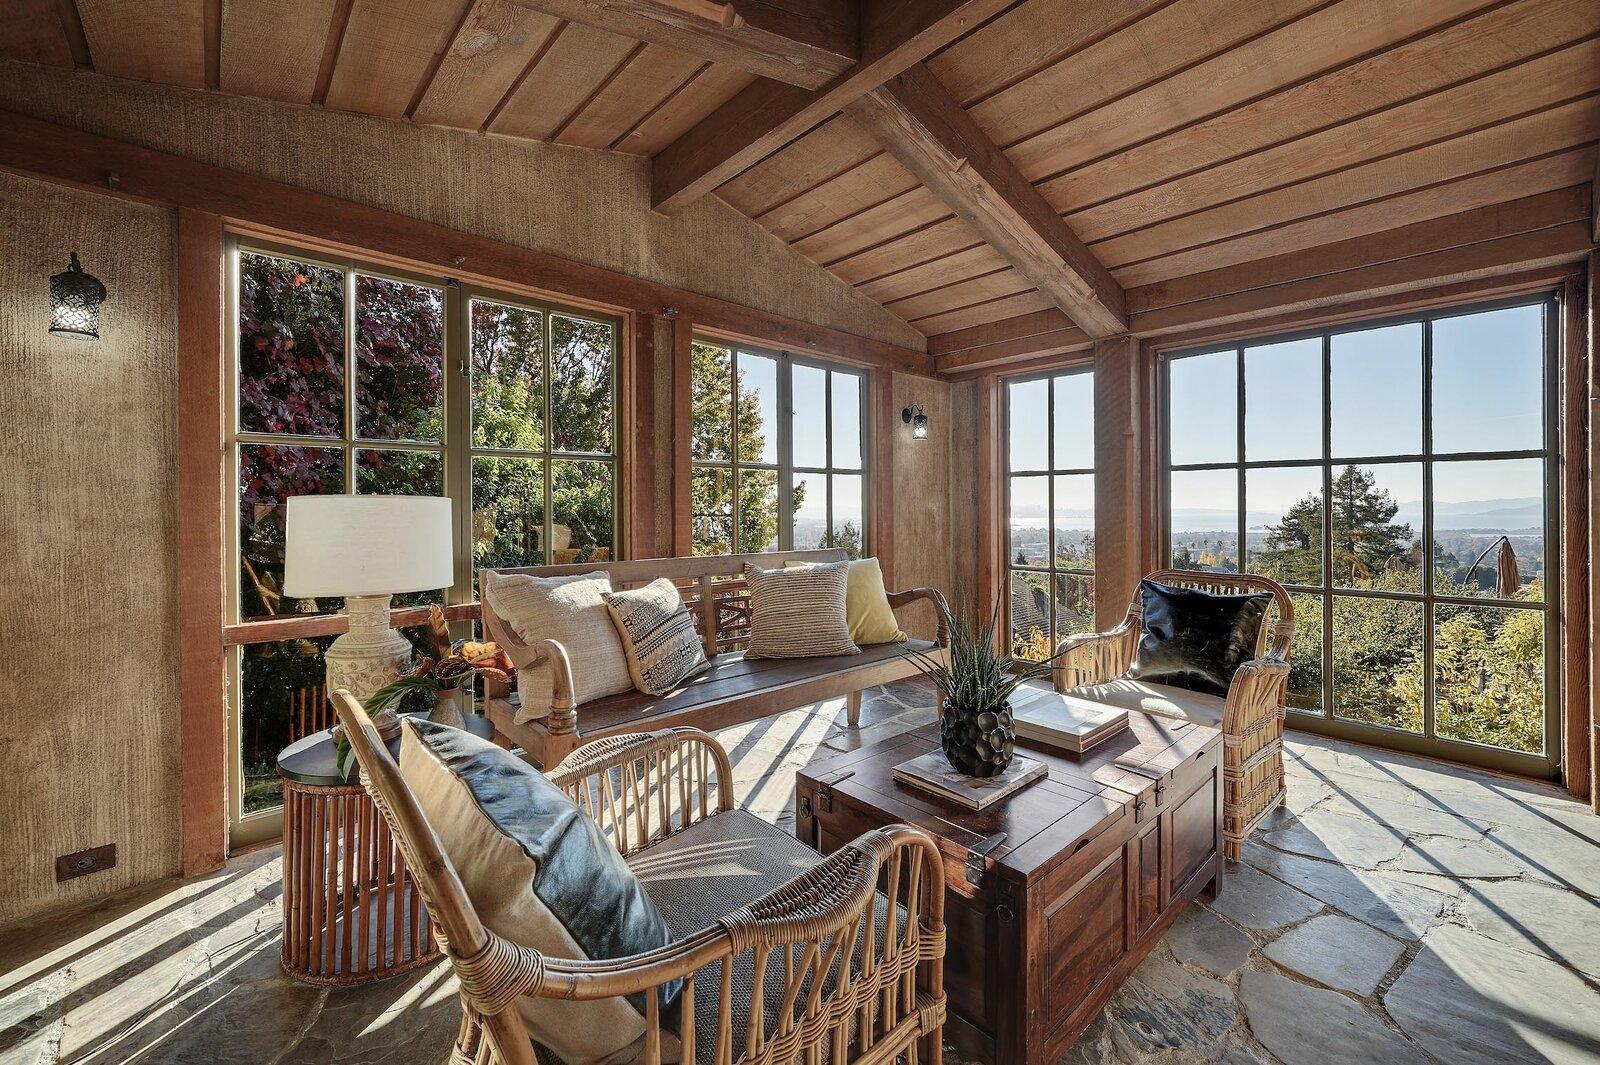 Ericsson-Bray House conservatory